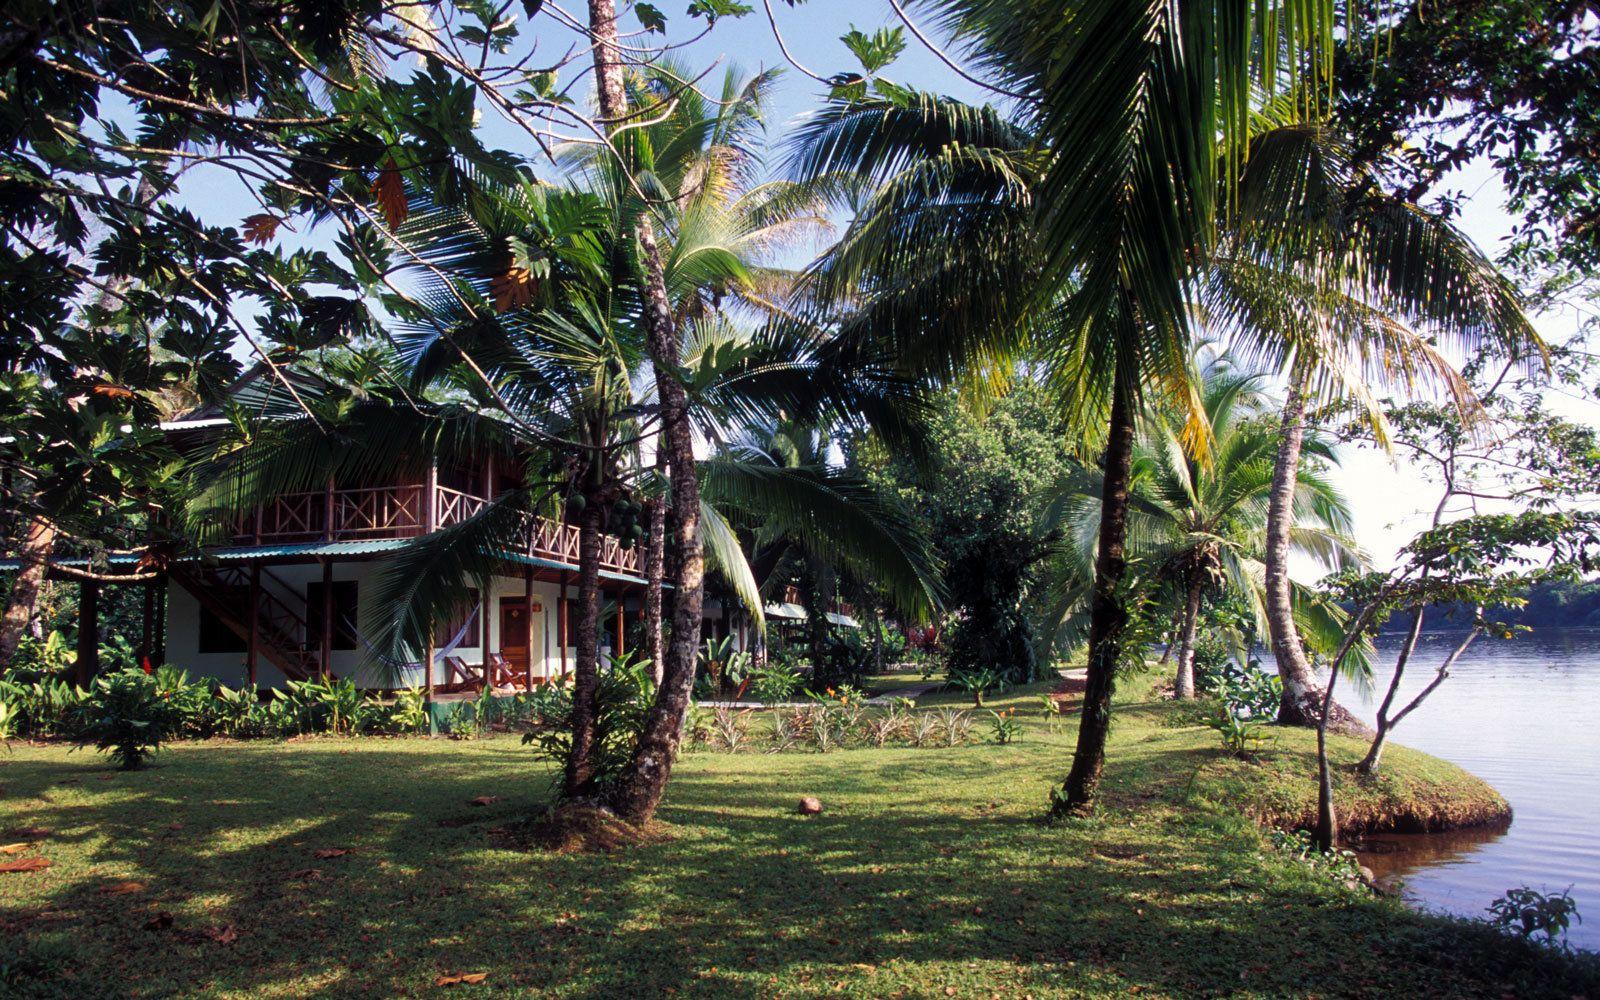 739a2090ab50216572e2c4ad860beea2 - Tortuga Lodge And Gardens Costa Rica